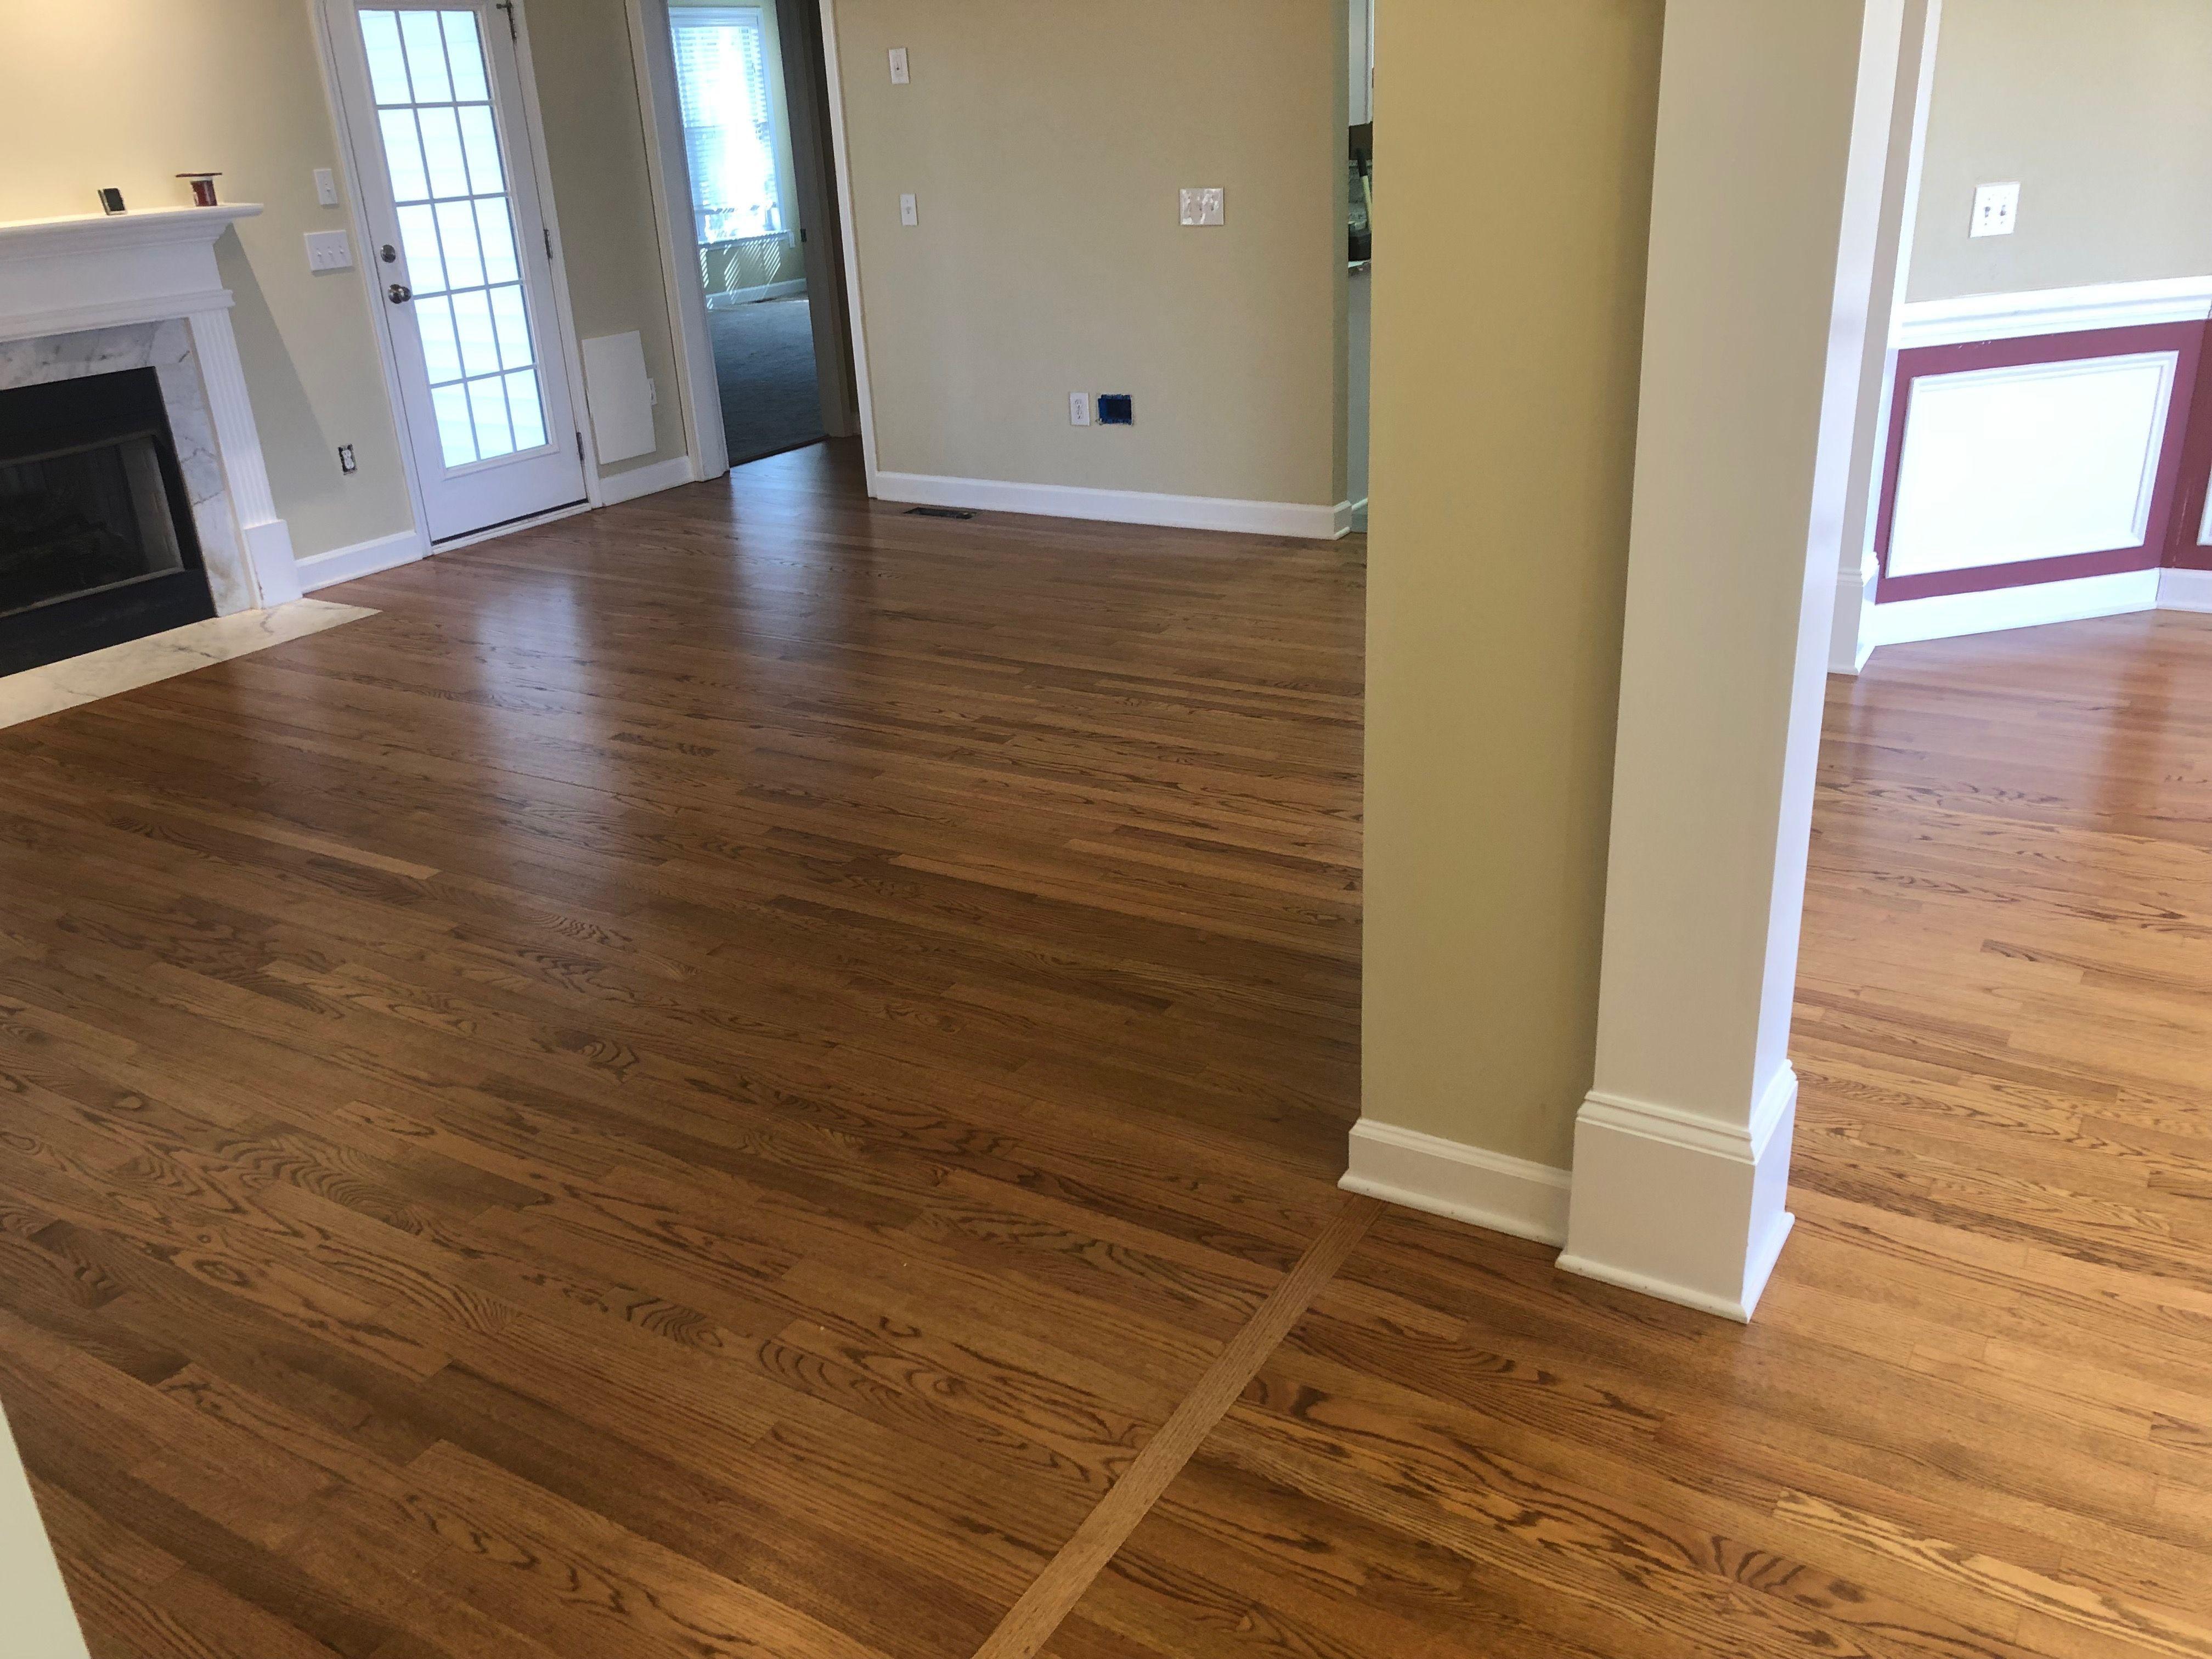 I Want This Spectacular Thing Pinesouthernyellowflooring Hardwood Floors Red Oak Hardwood Red Oak Floors